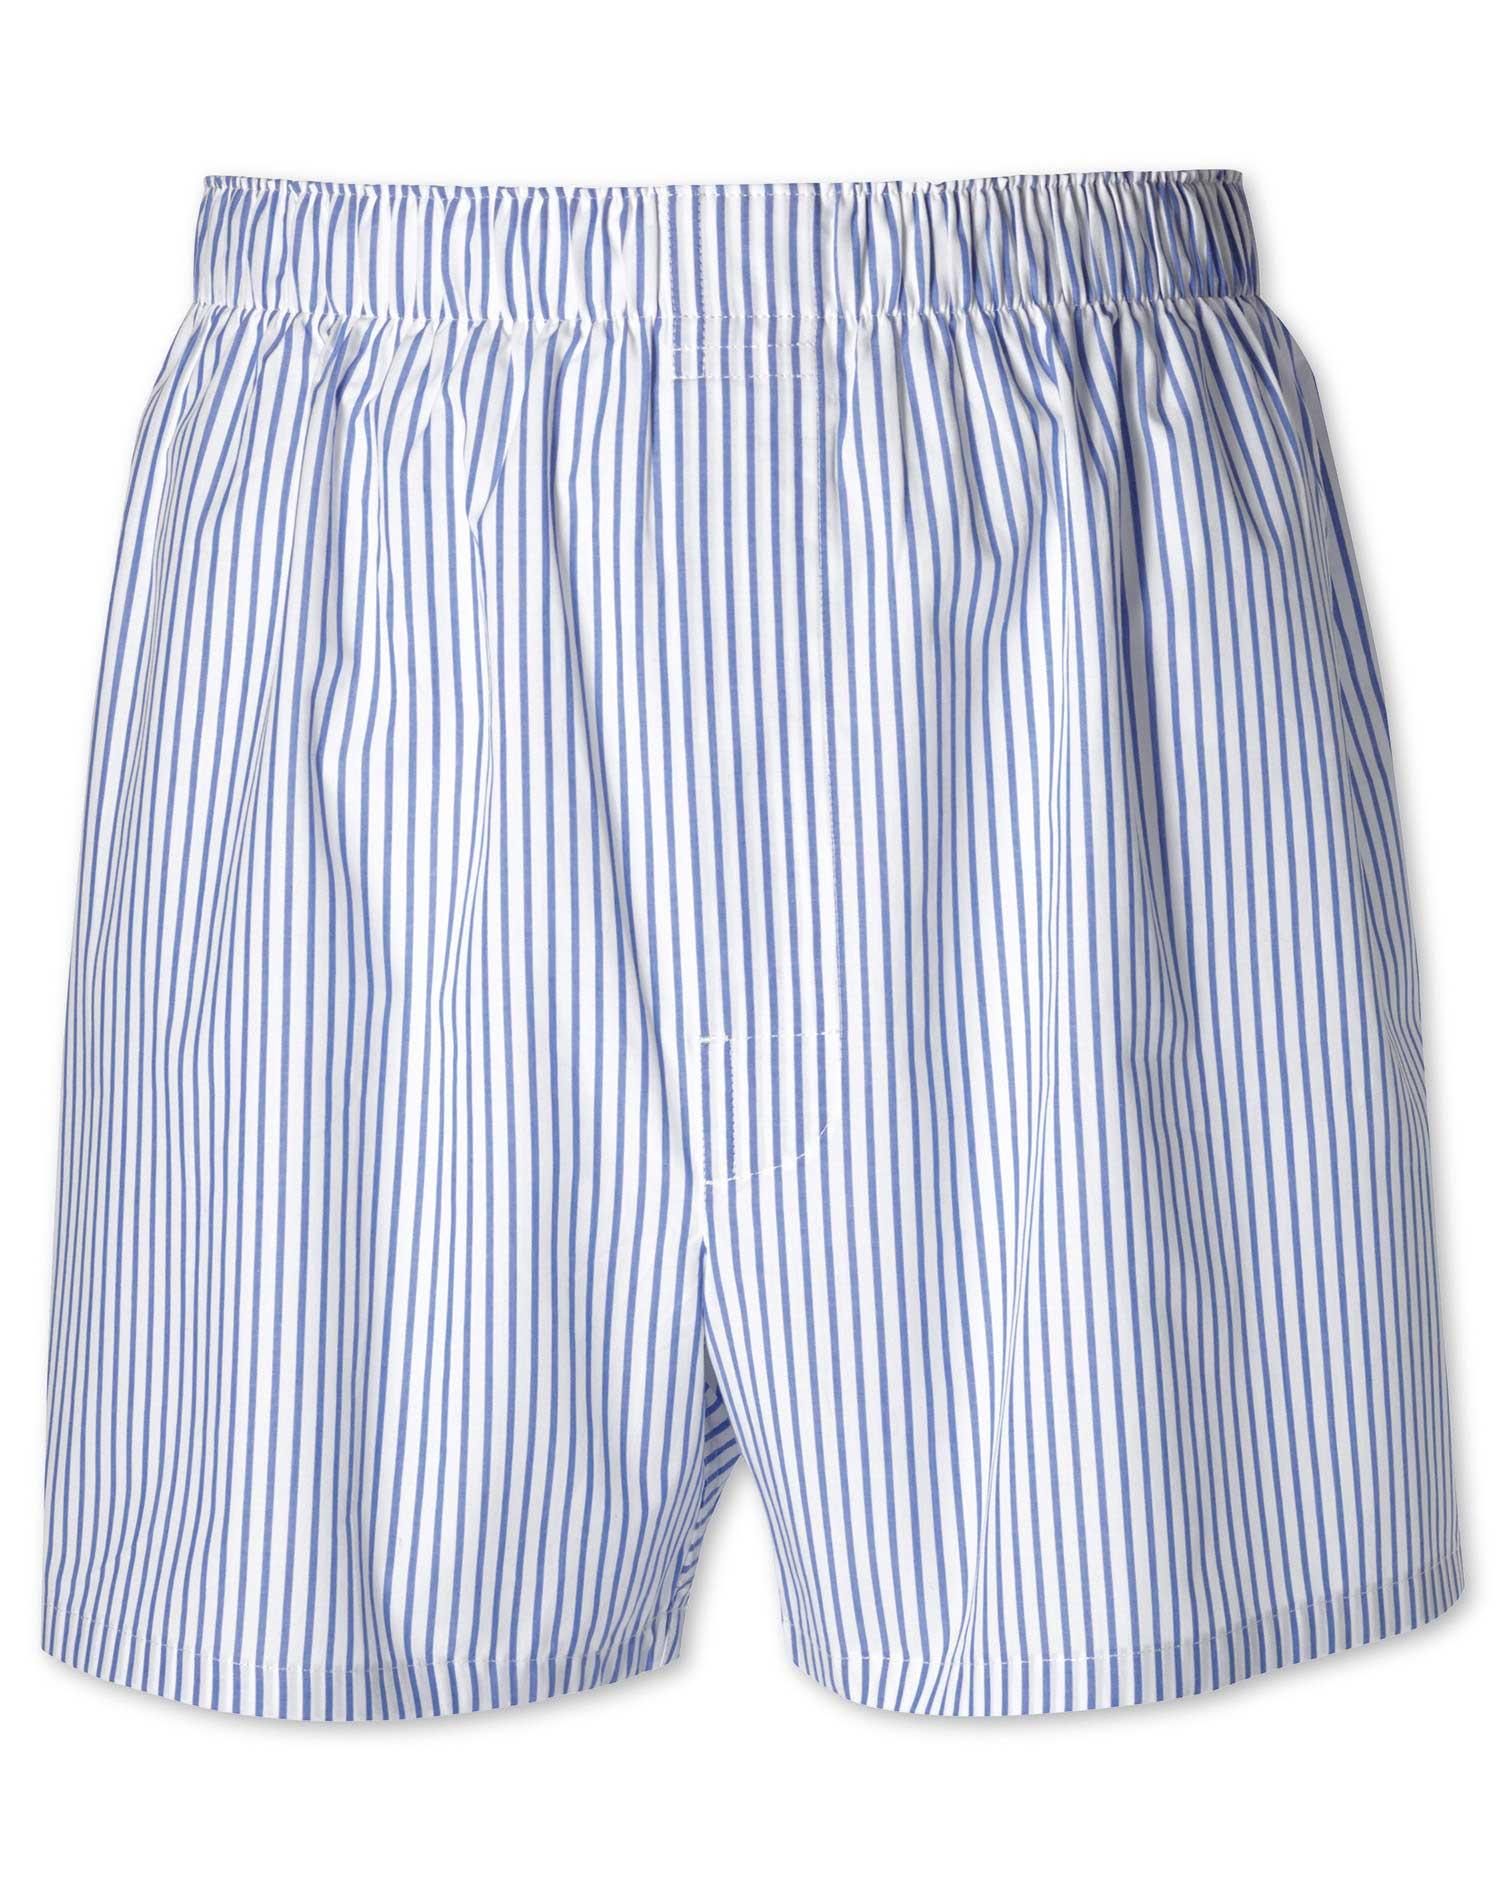 Sky Blue Stripe Woven Boxers Size Medium by Charles Tyrwhitt